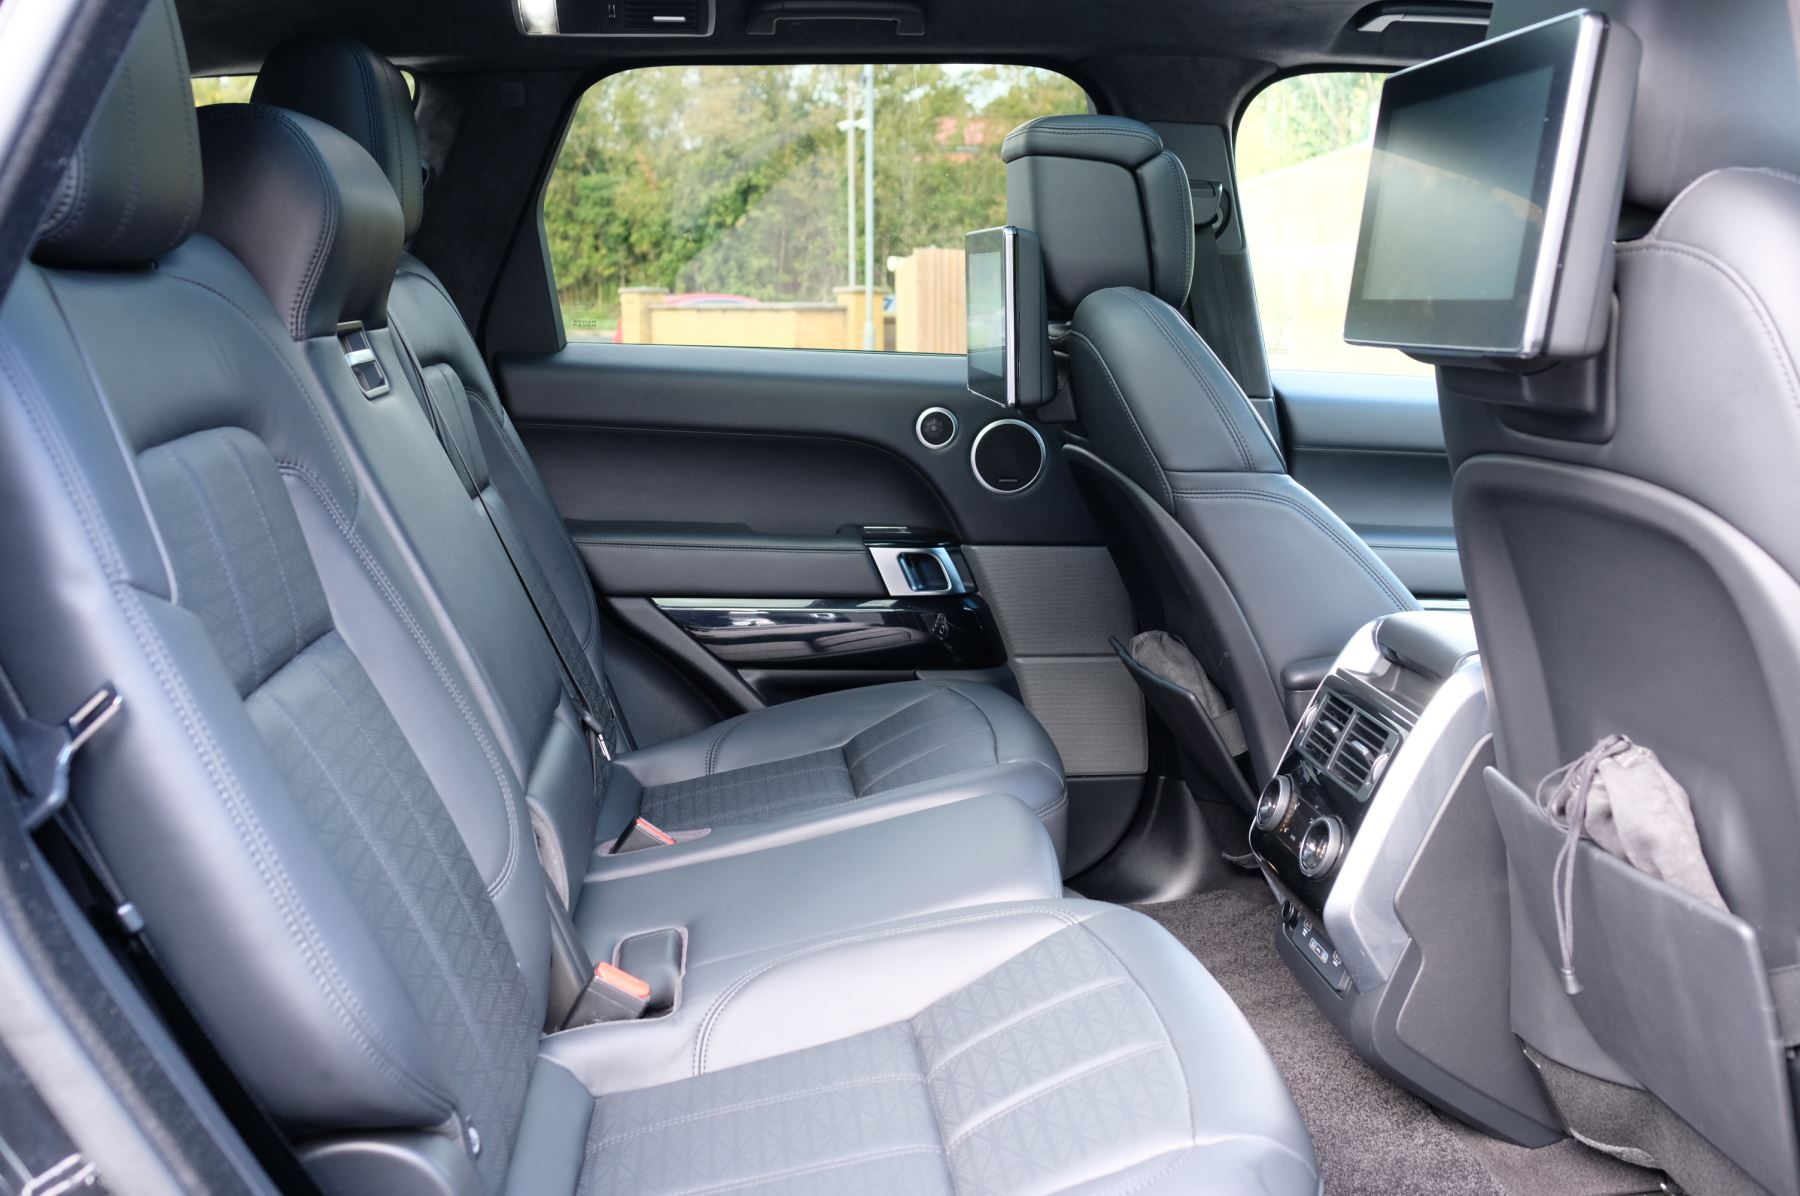 Land Rover Range Rover Sport 3.0 SDV6 Autobiography Dynamic 5dr image 13